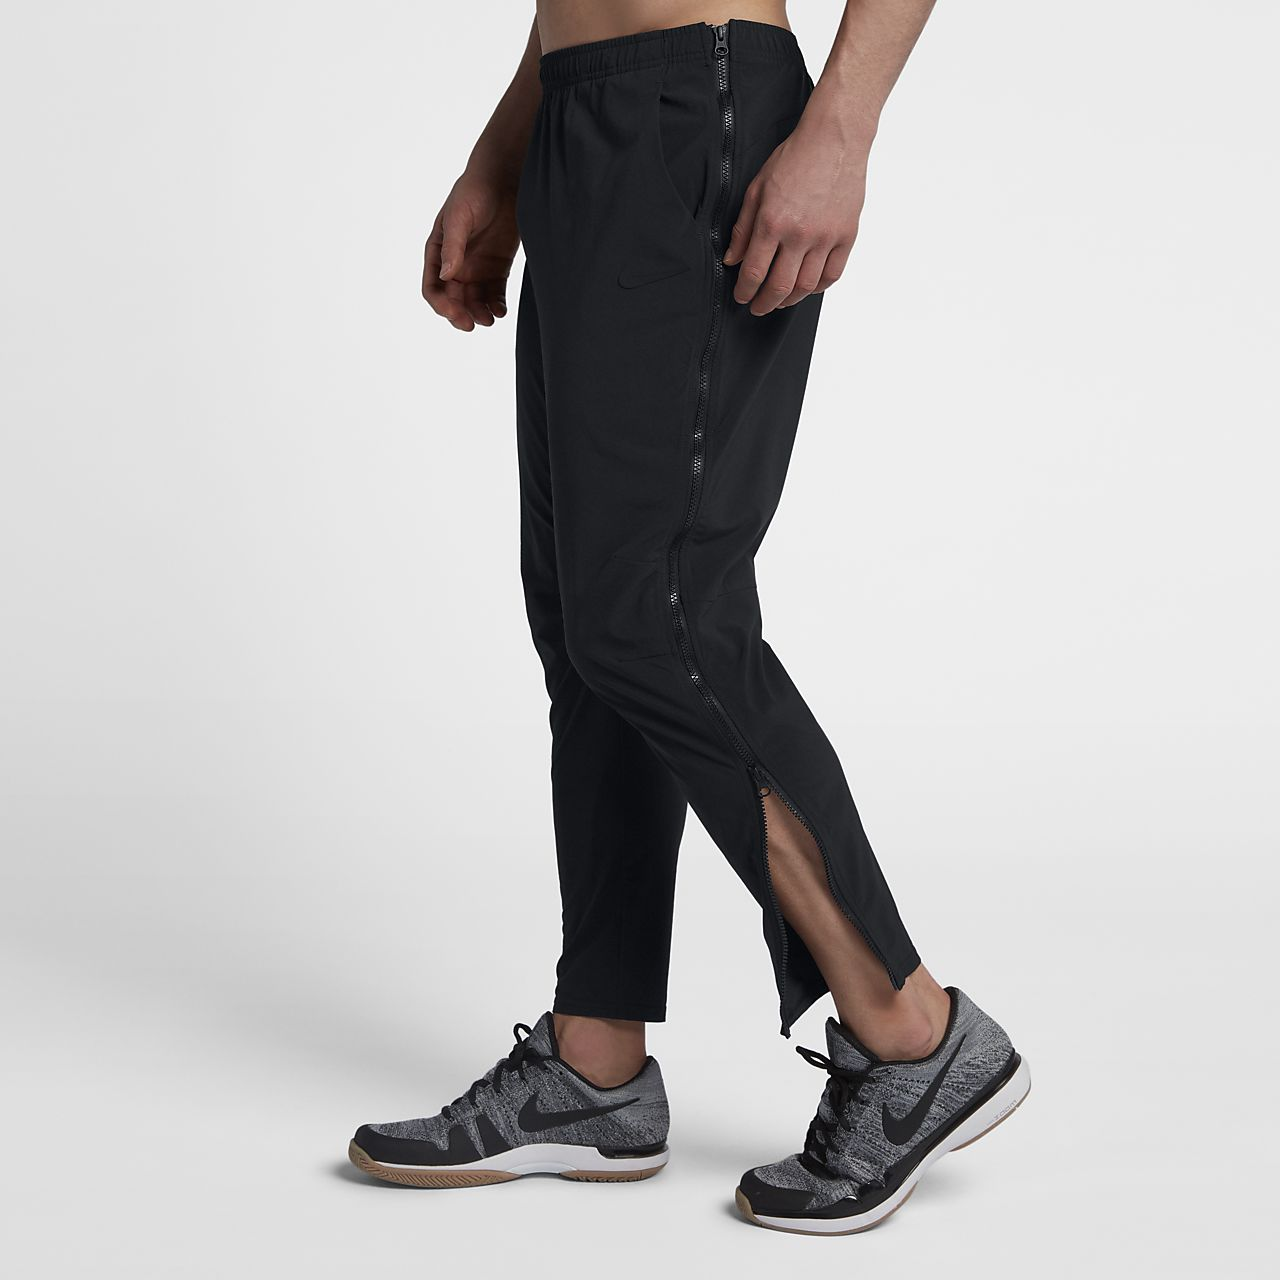 a60f5caffef95 Low Resolution NikeCourt Flex Men s Tennis Trousers NikeCourt Flex Men s  Tennis Trousers